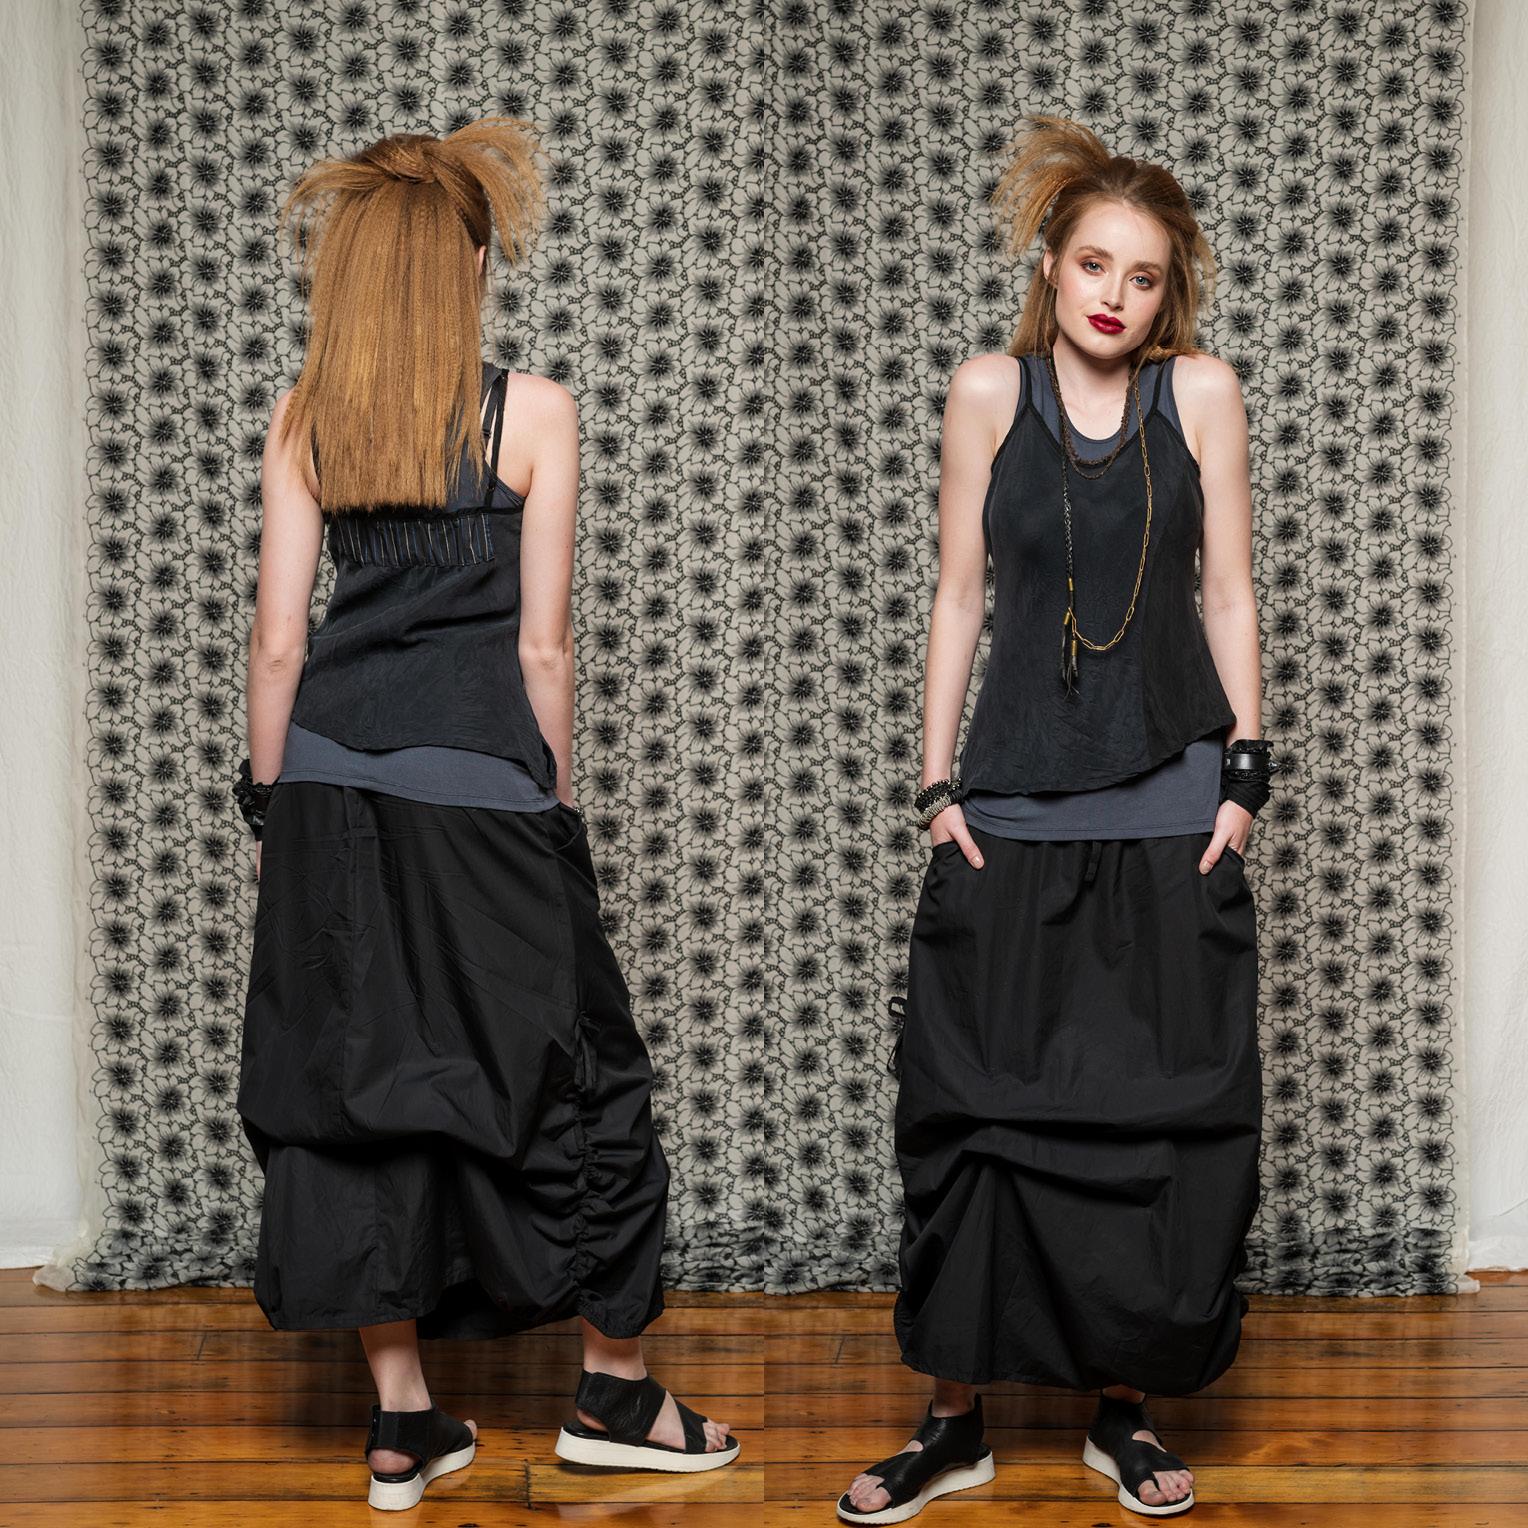 Obsidian Top, Esker Top & Marmalade Skirt